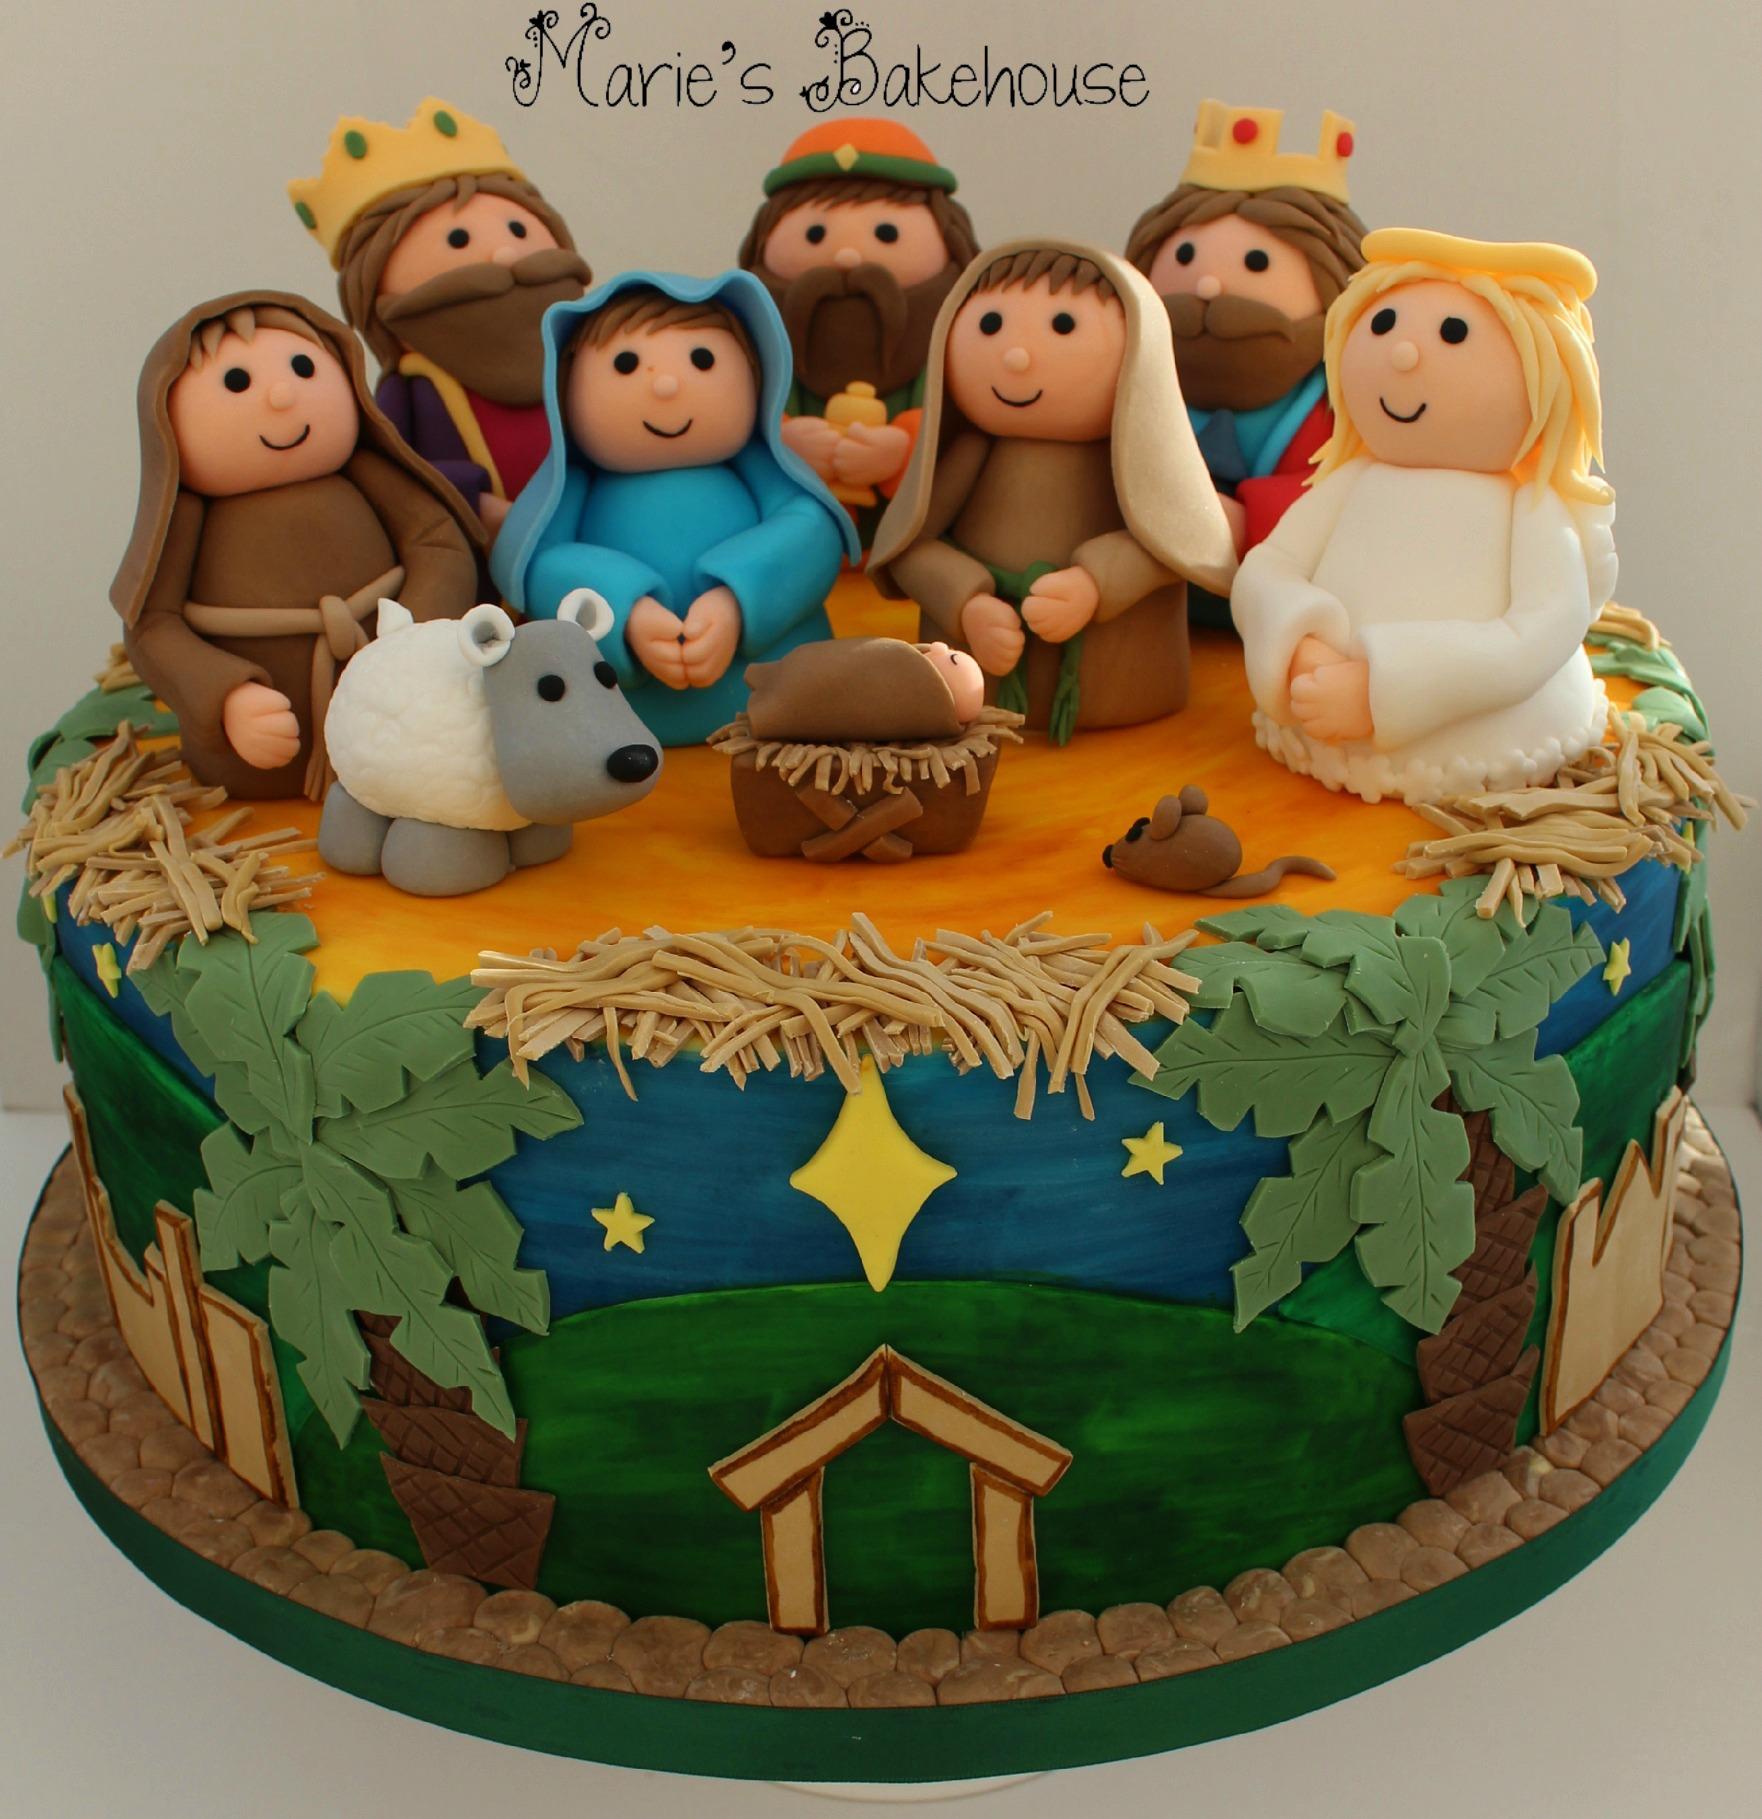 Nativity Christmas Cake Design : Awards and Shows - Maries Bakehouse